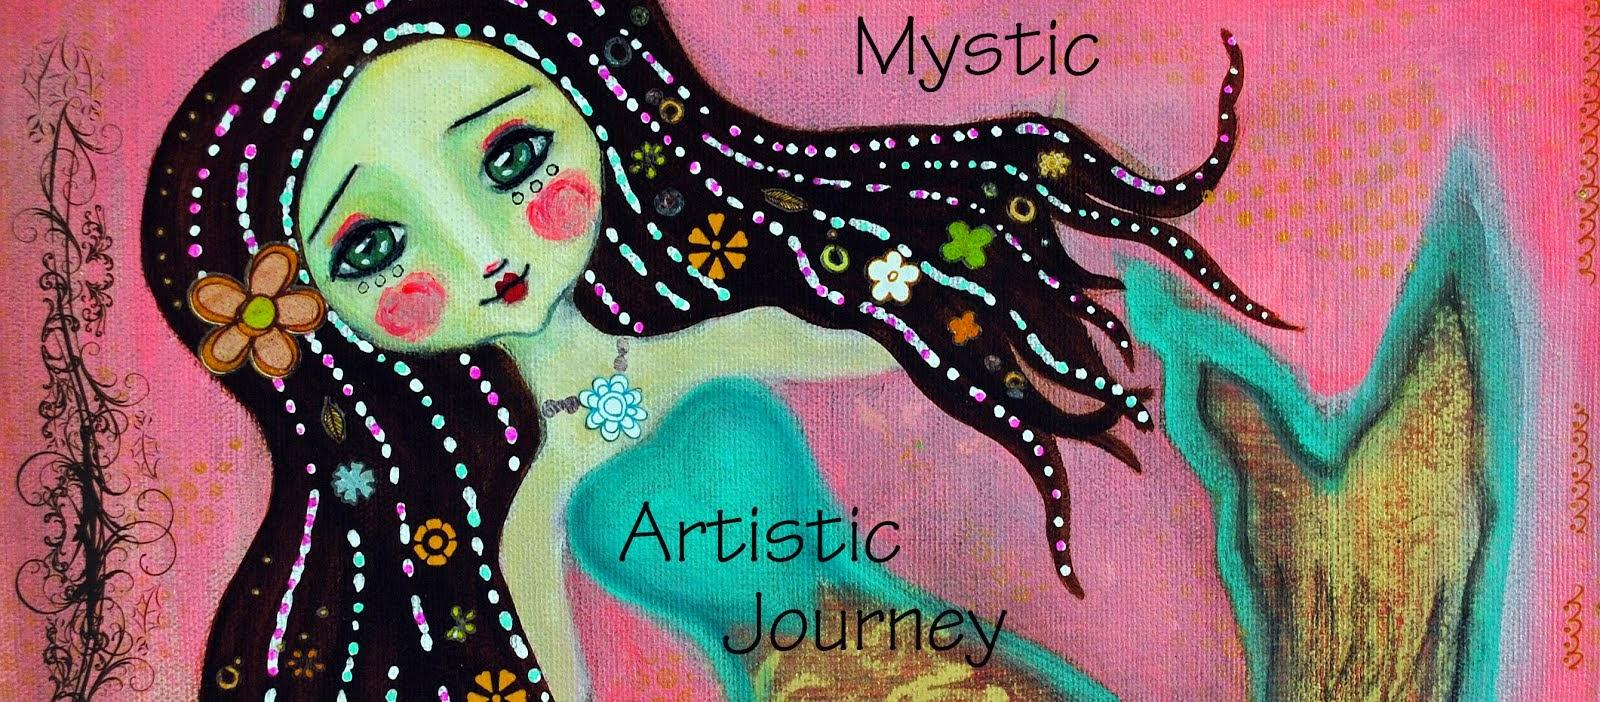 Mystic Artistic Journey